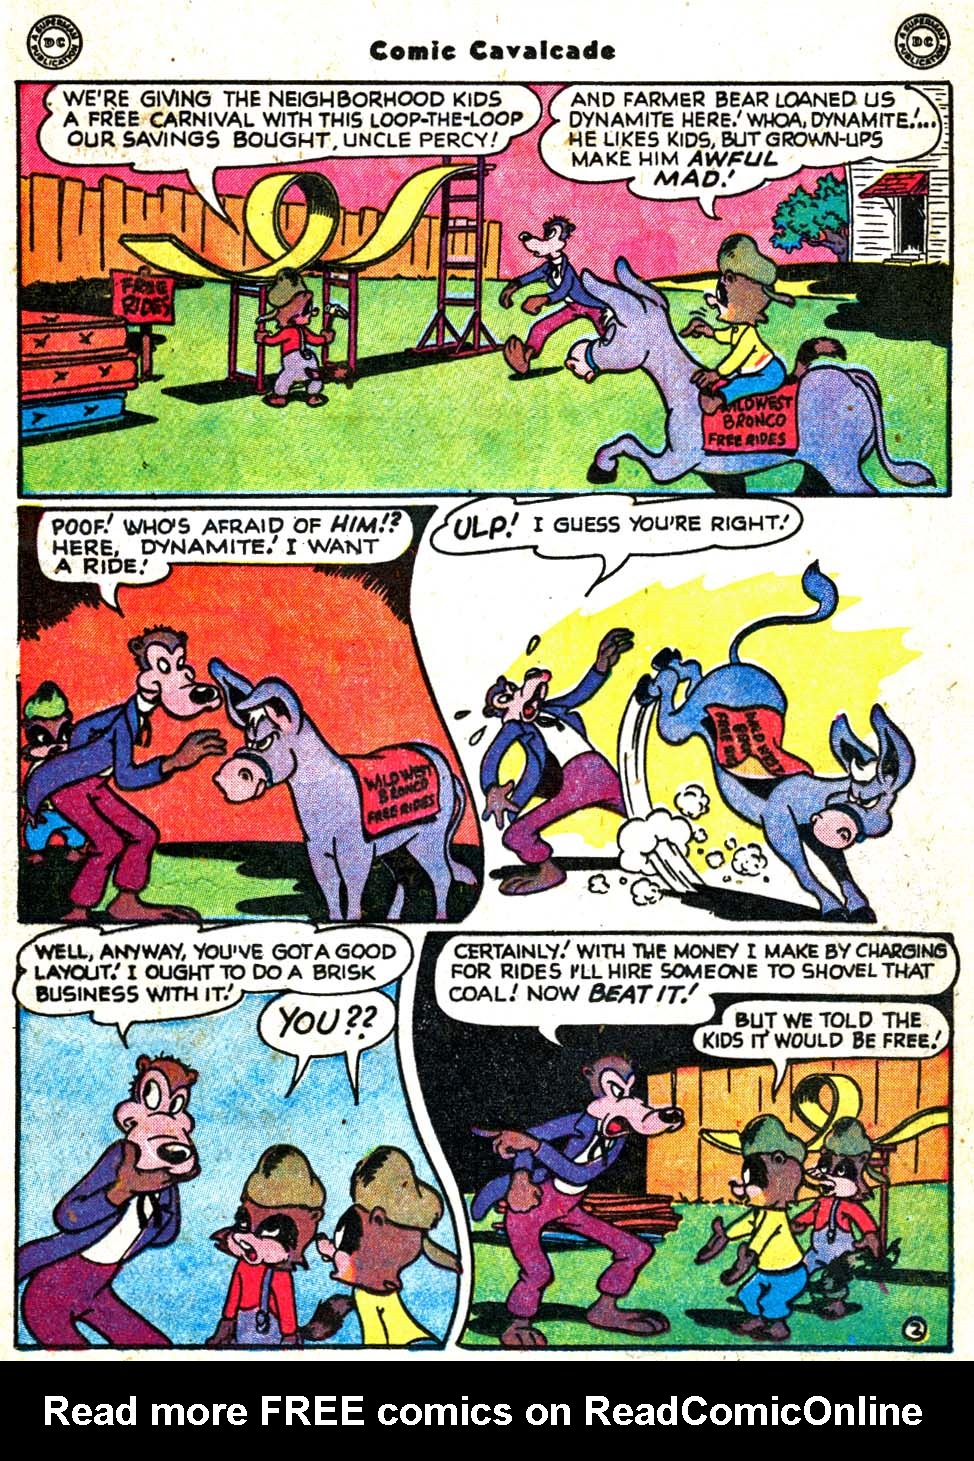 Comic Cavalcade issue 31 - Page 19